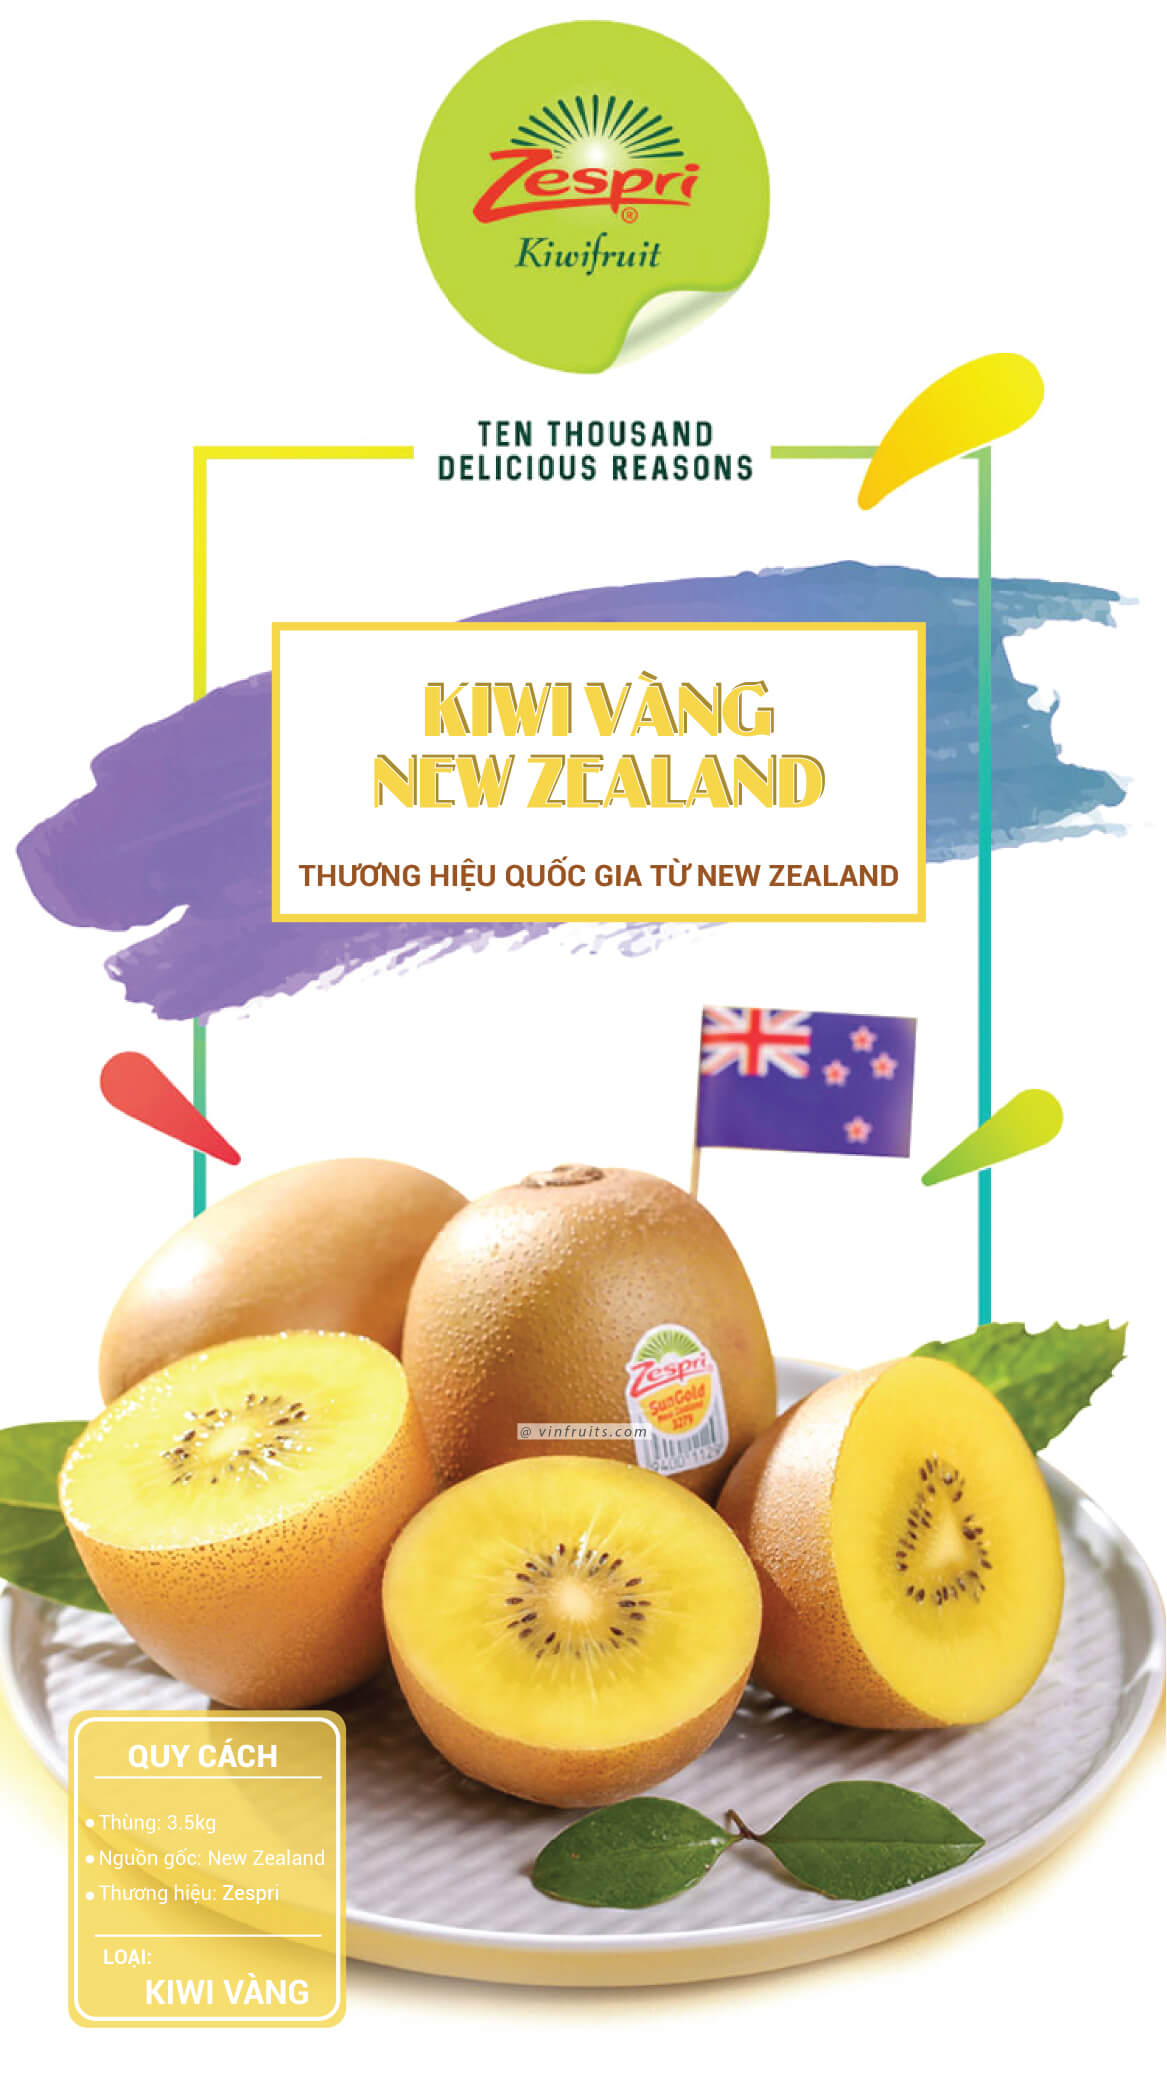 Giong kiwi vang New Zealand - vinfruits